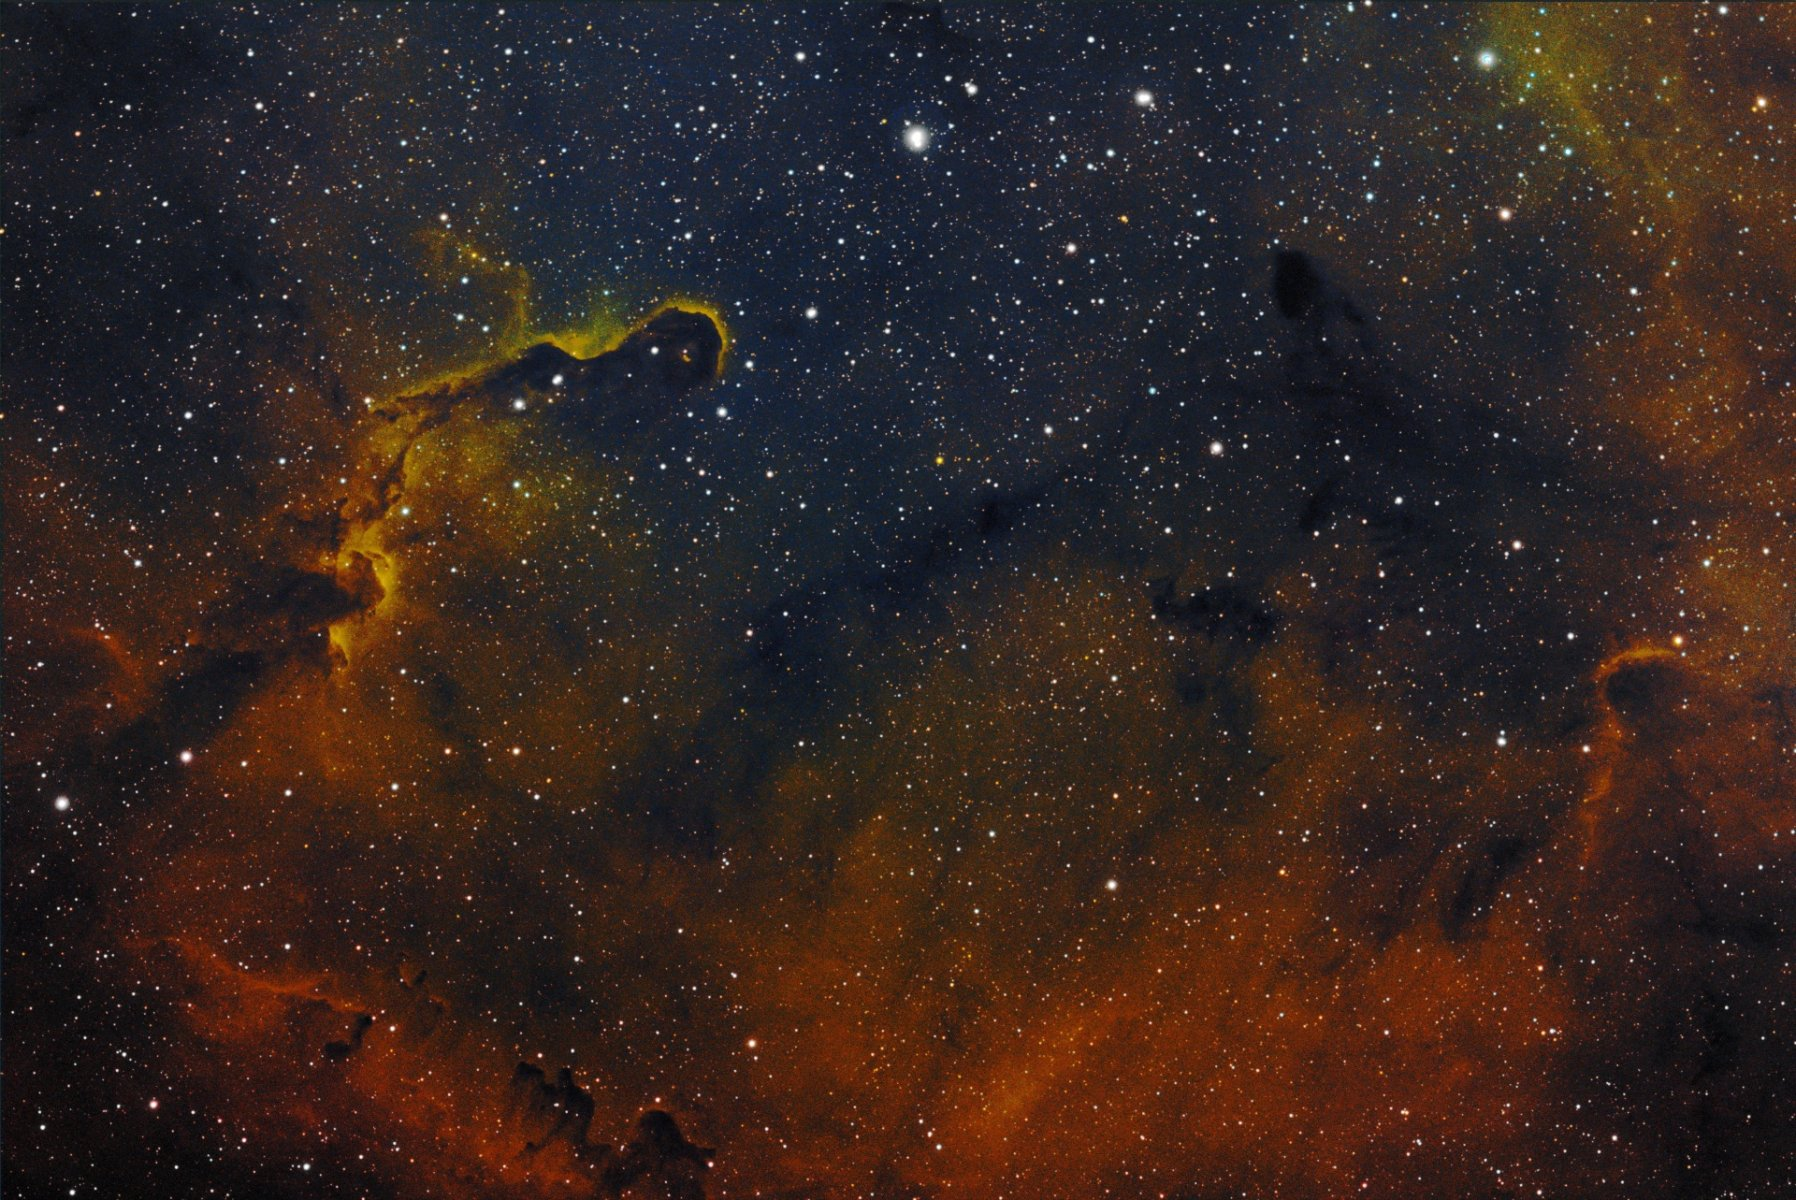 IC1396_Elephant_S2HaO3_1920.jpg